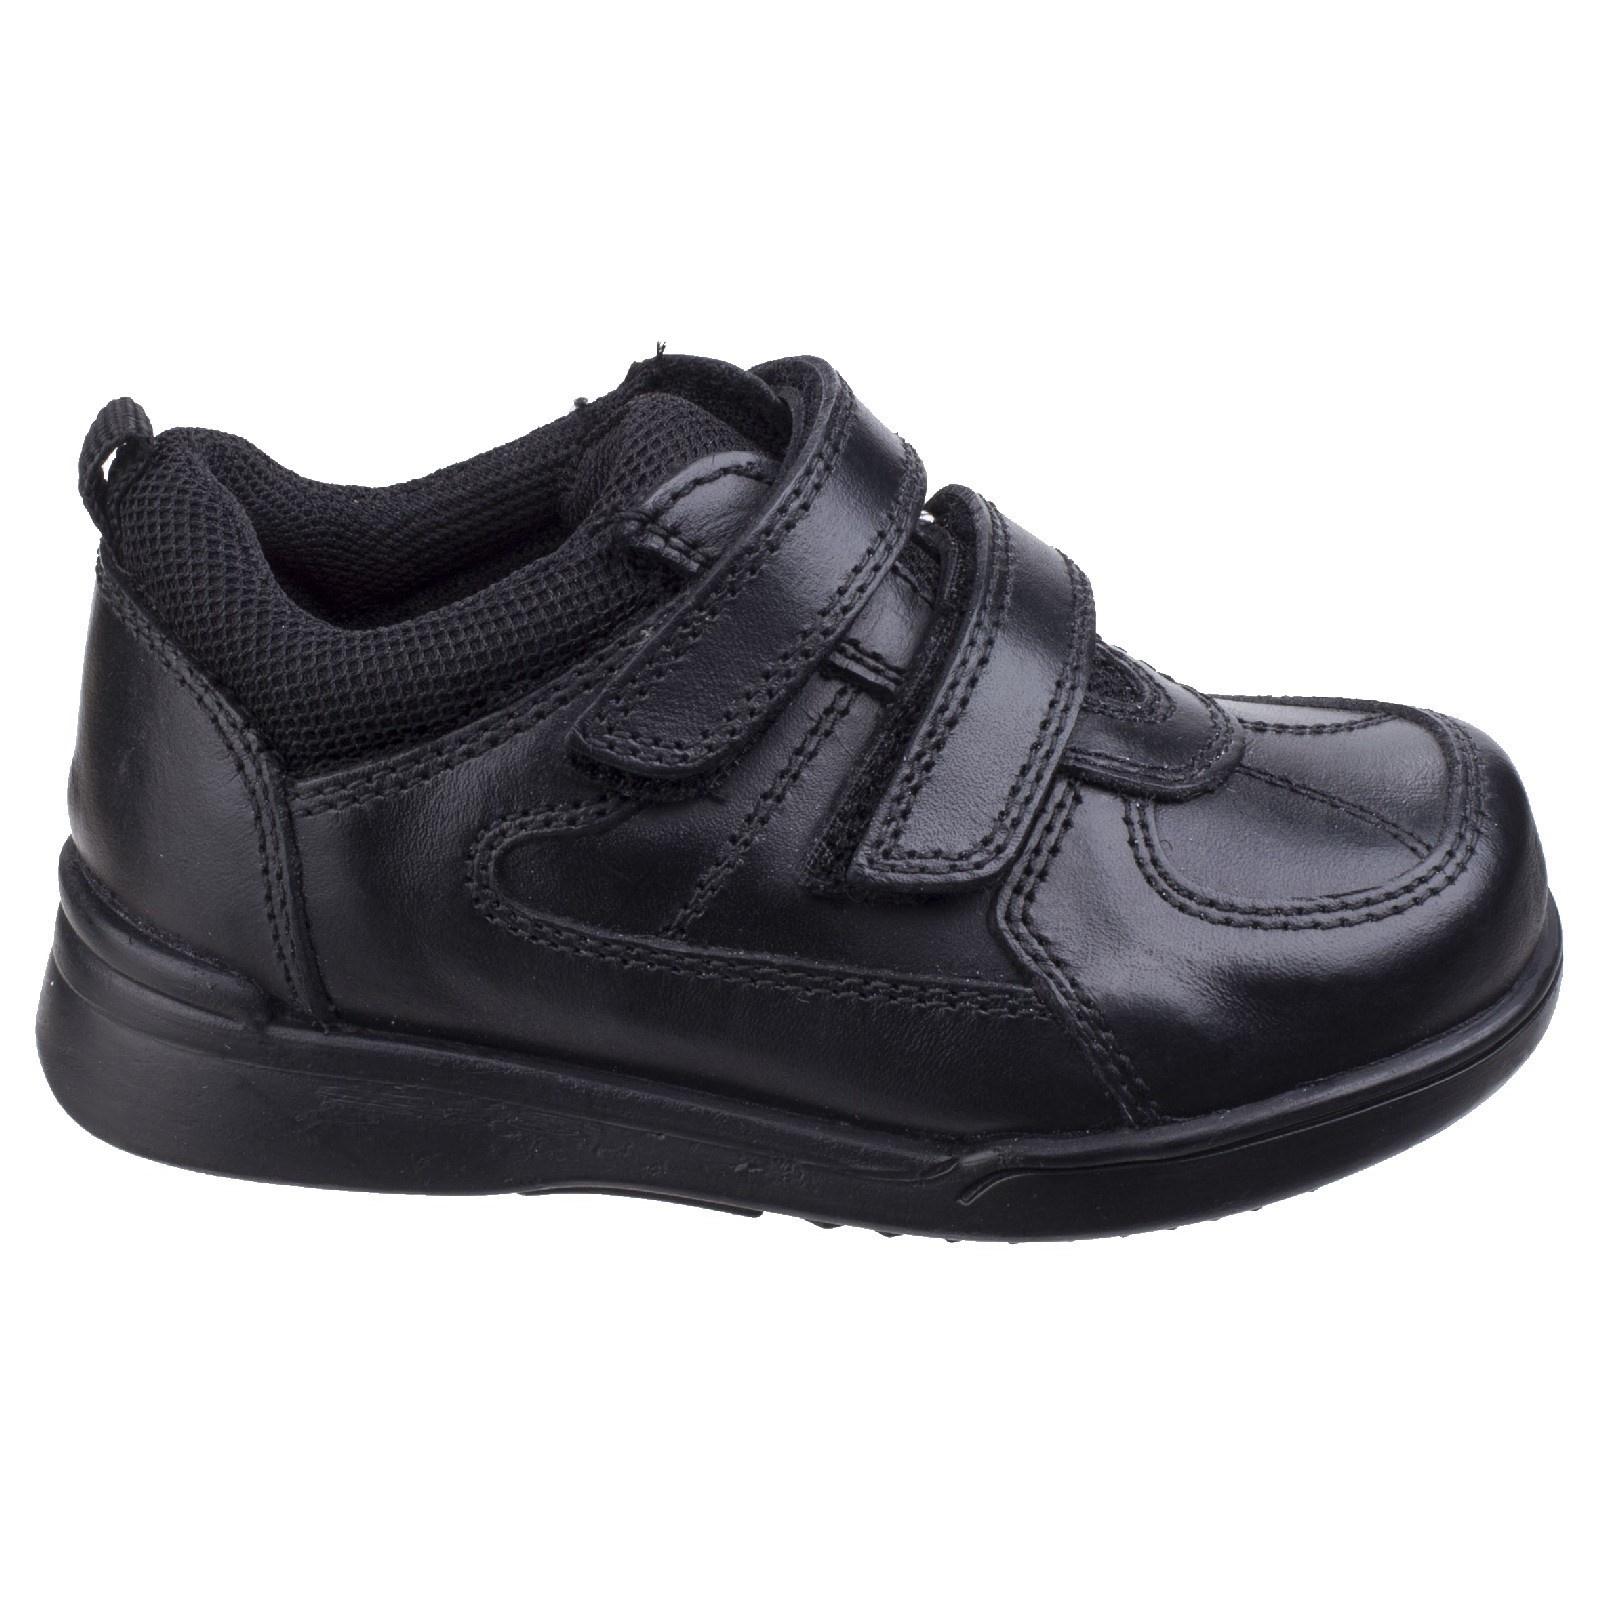 Hush Puppies Liam Black Leather